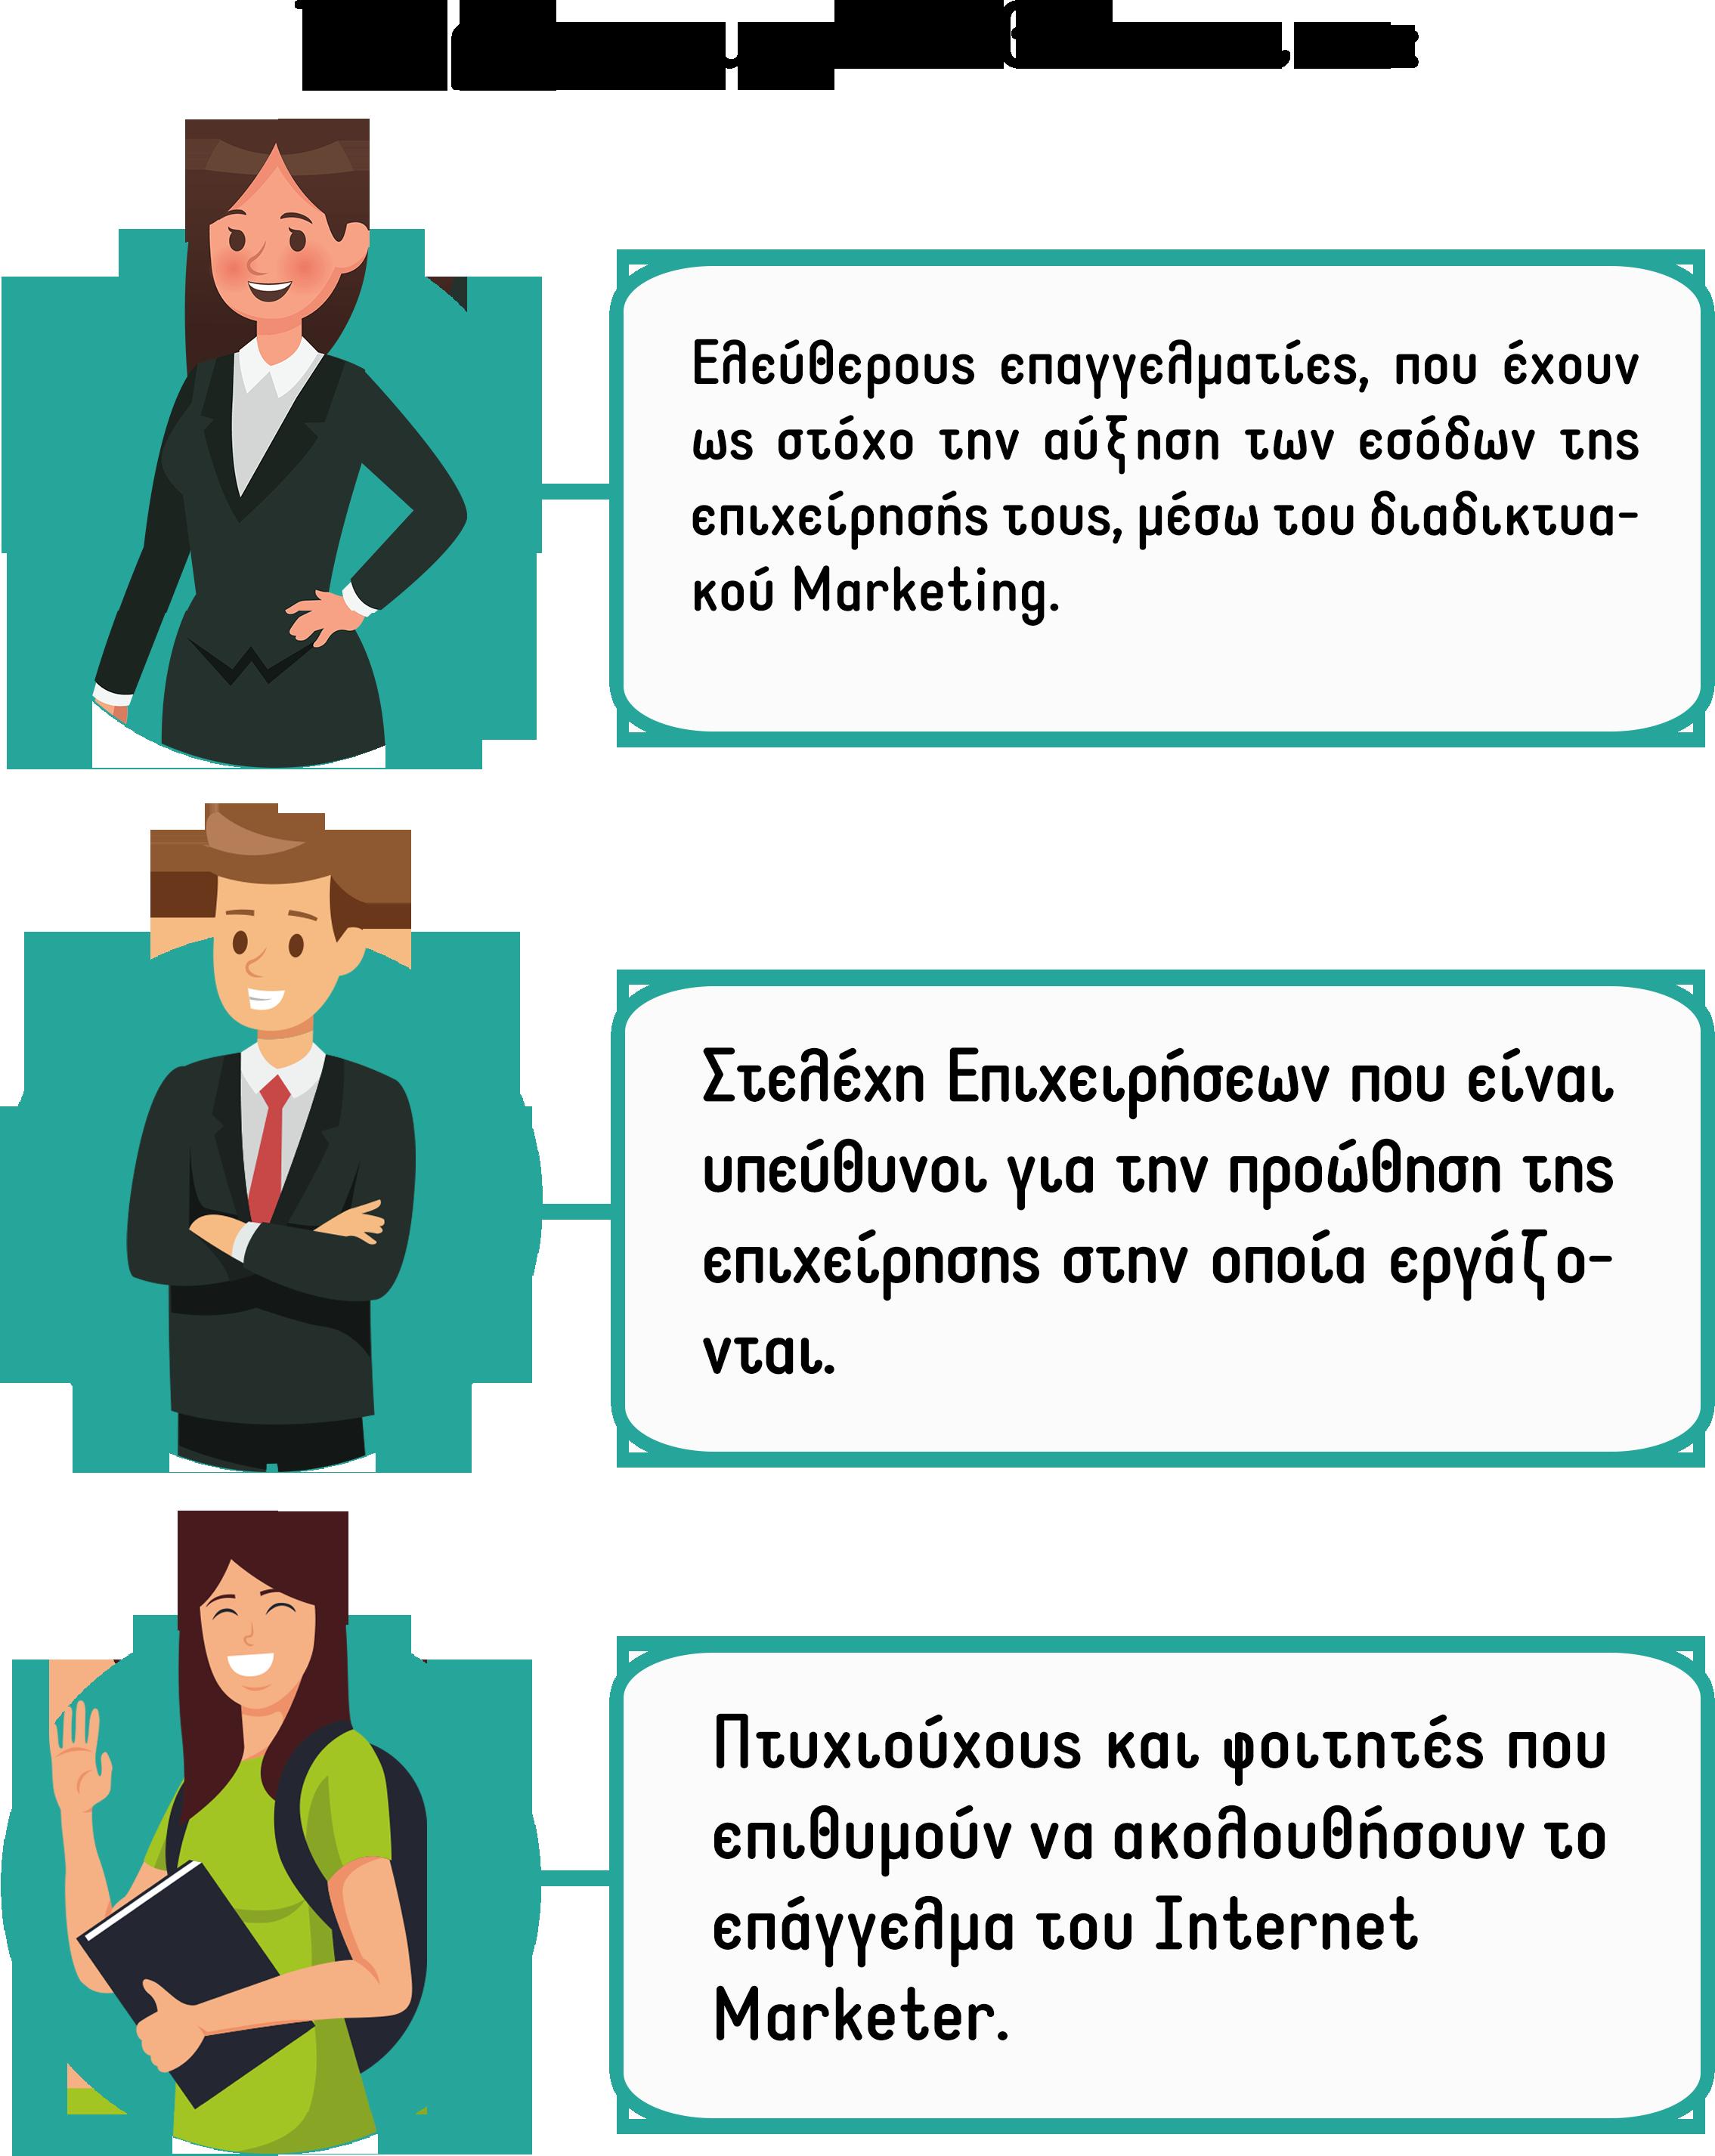 Internet & Social Media Marketing – Μεταπτυχιακή Εξειδίκευση